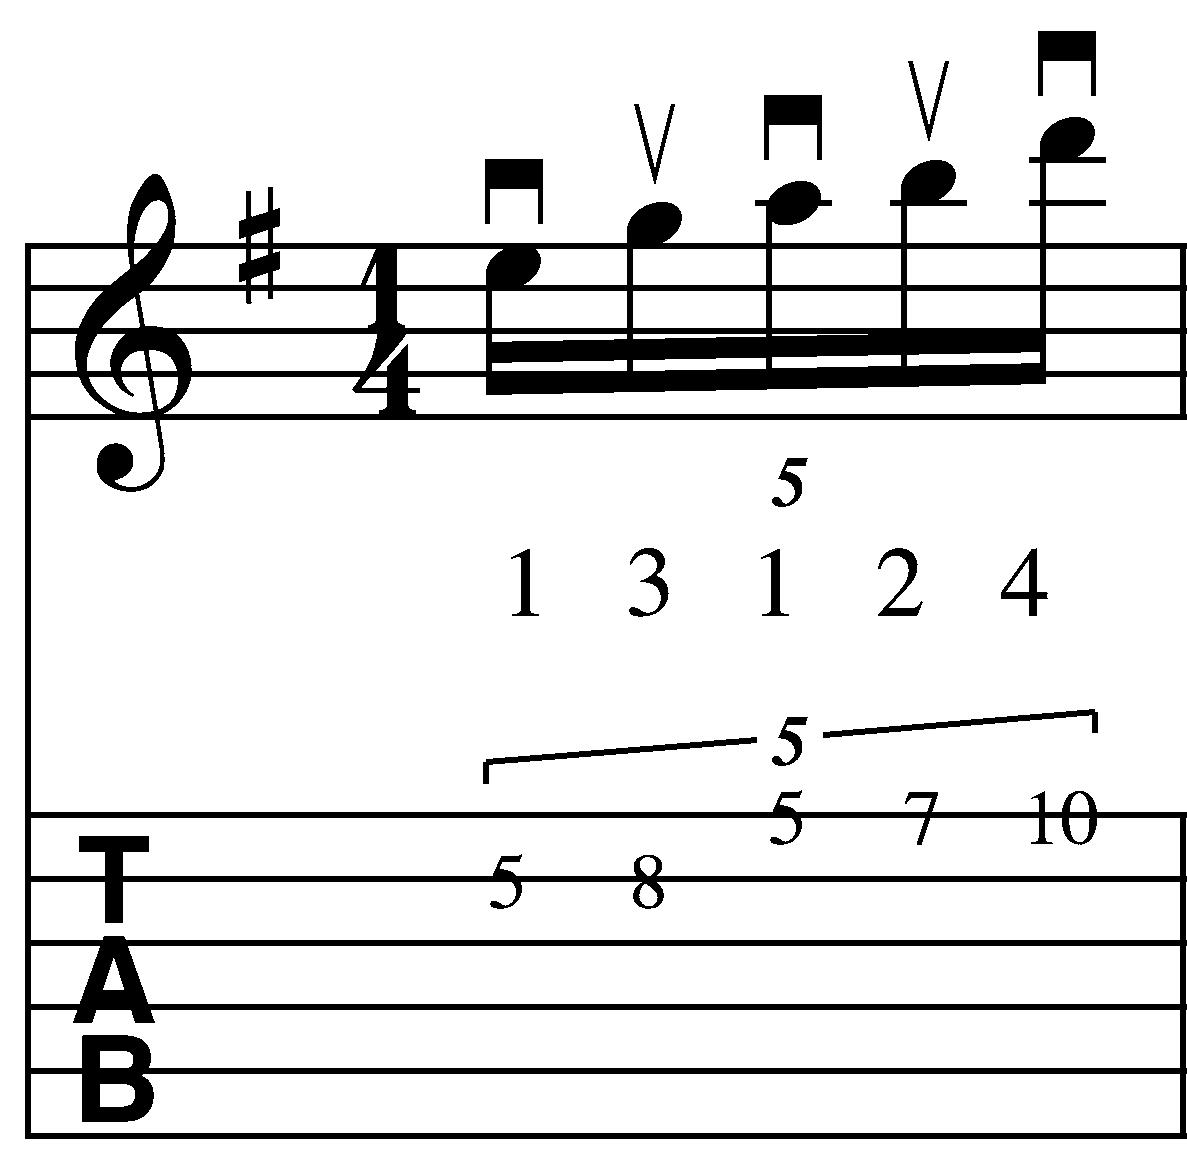 Making Sense Of The Pentatonic Scale Diagonal Forms Part Two Free Download Bass Guitar Wiring Diagram